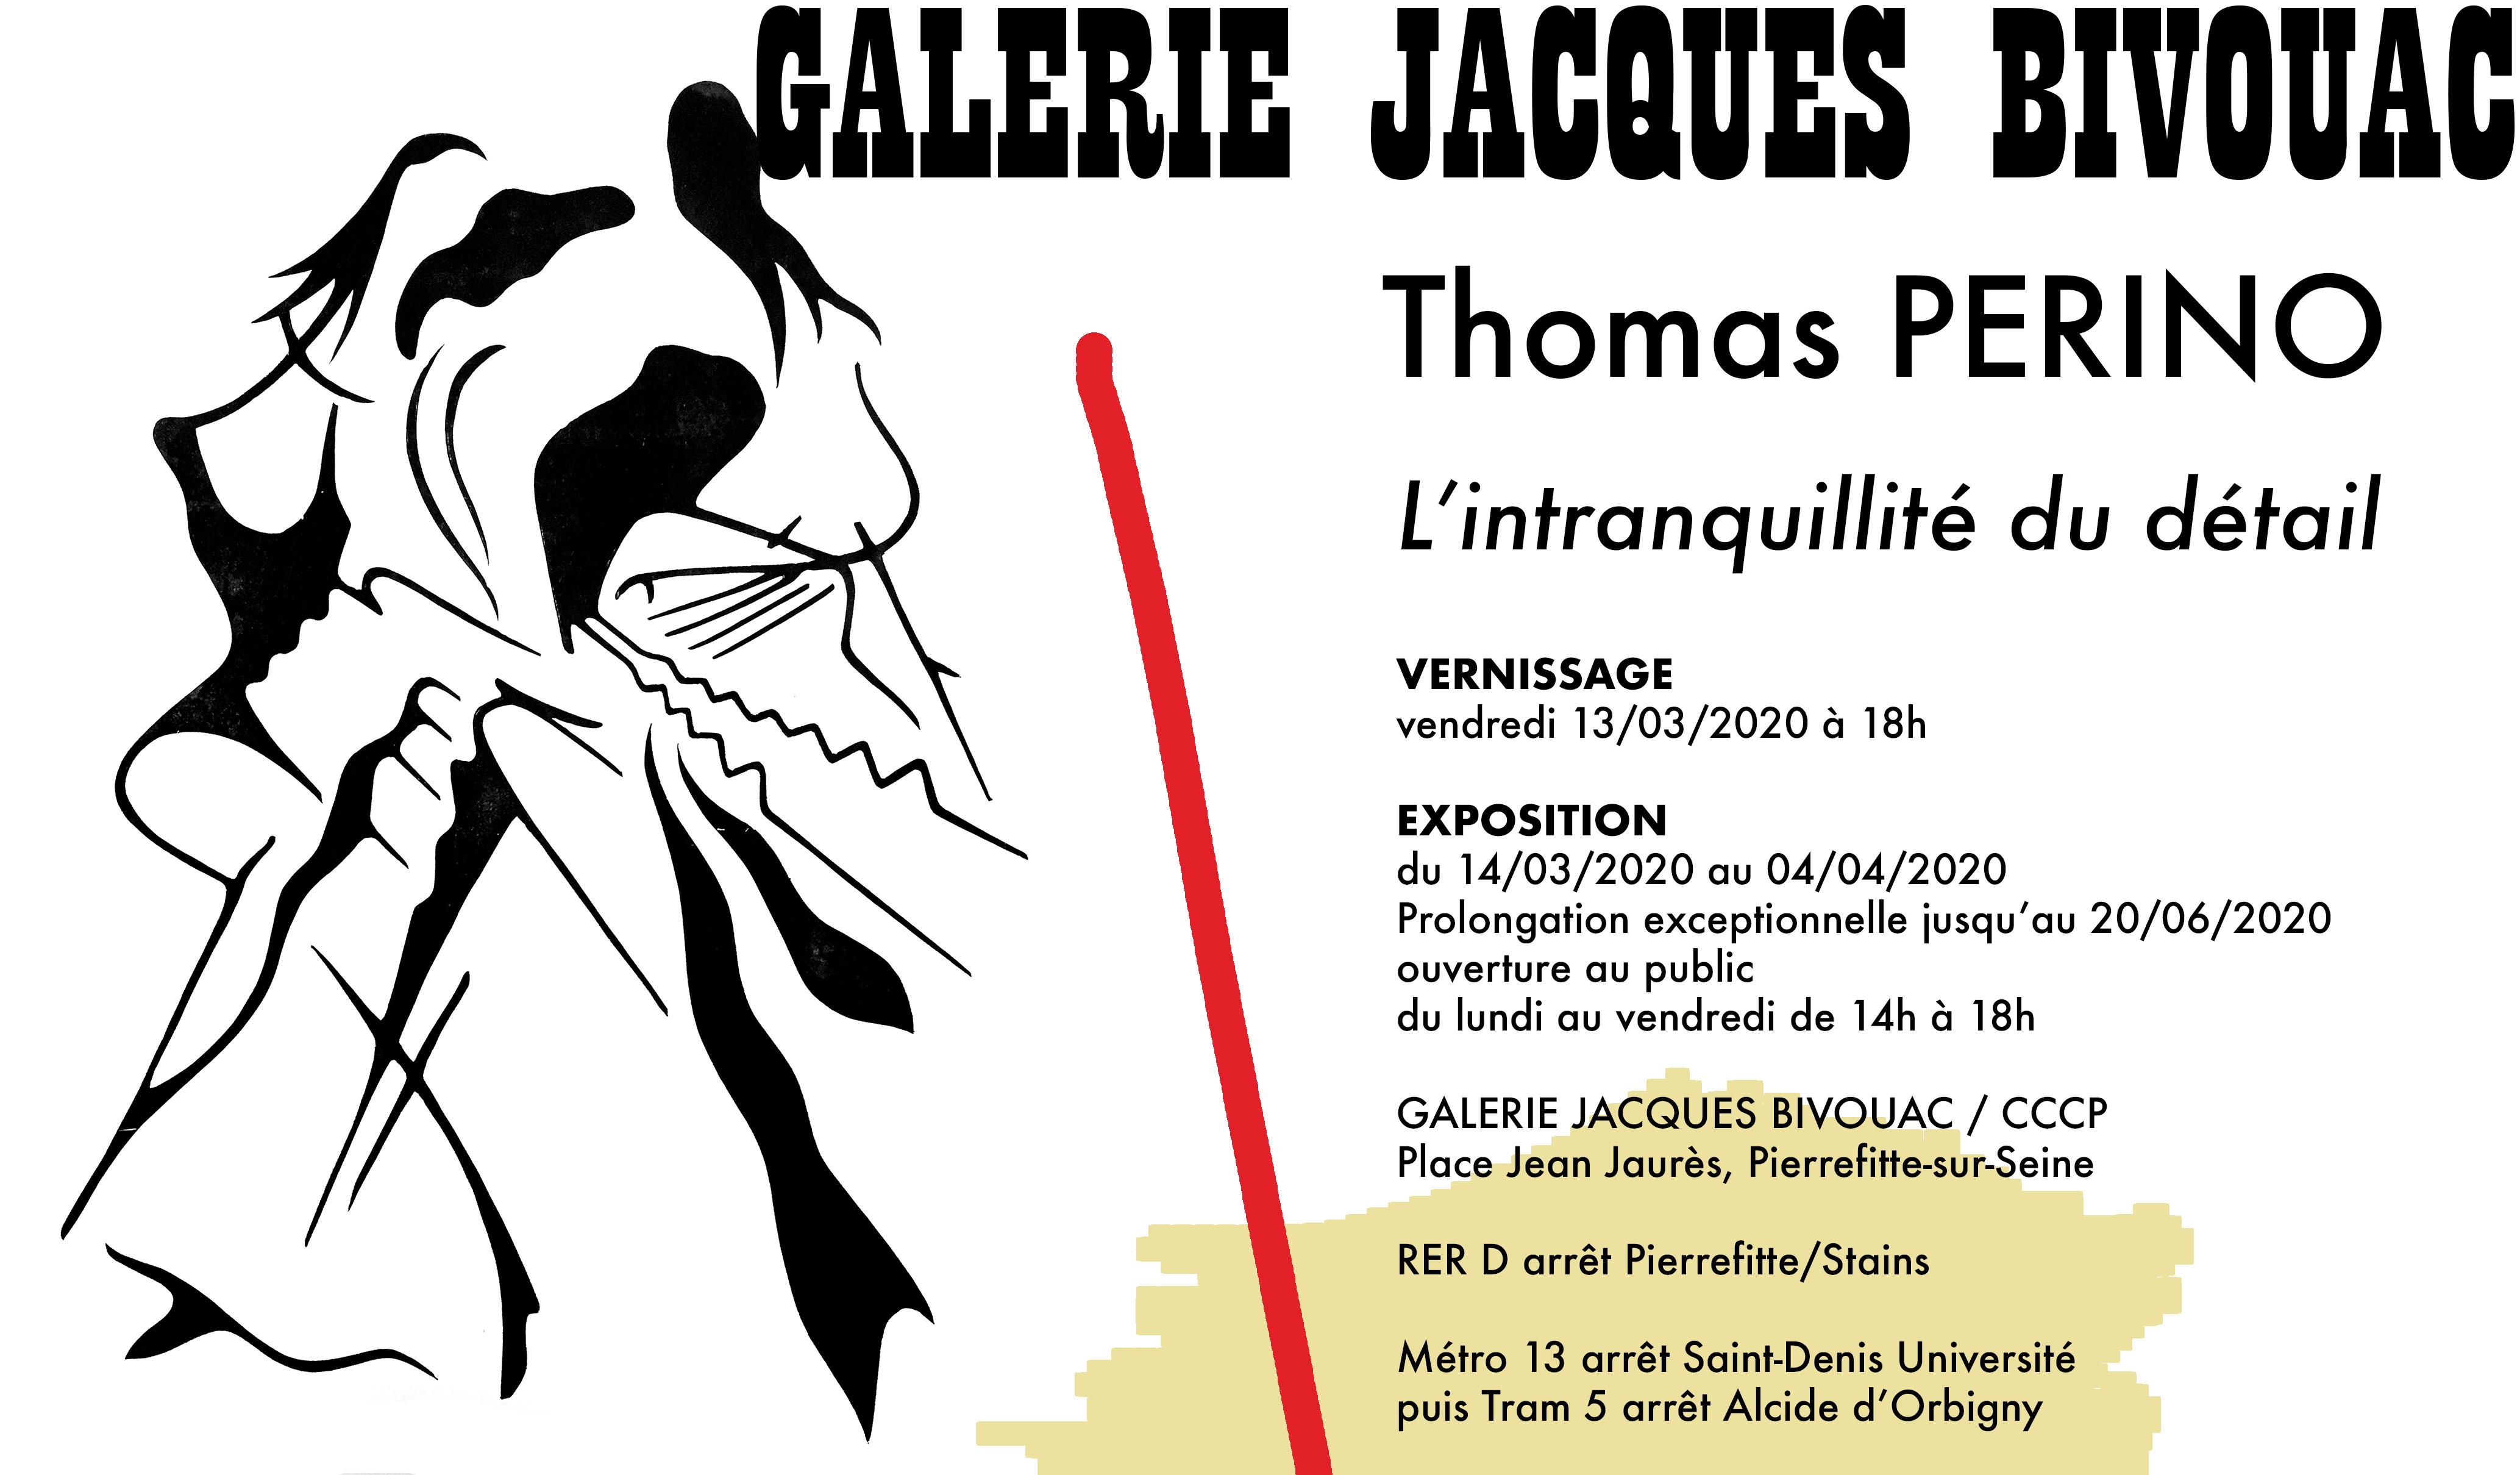 Galerie-Jacques-BIVOUAC---Thomas-PERINO--Prolongation